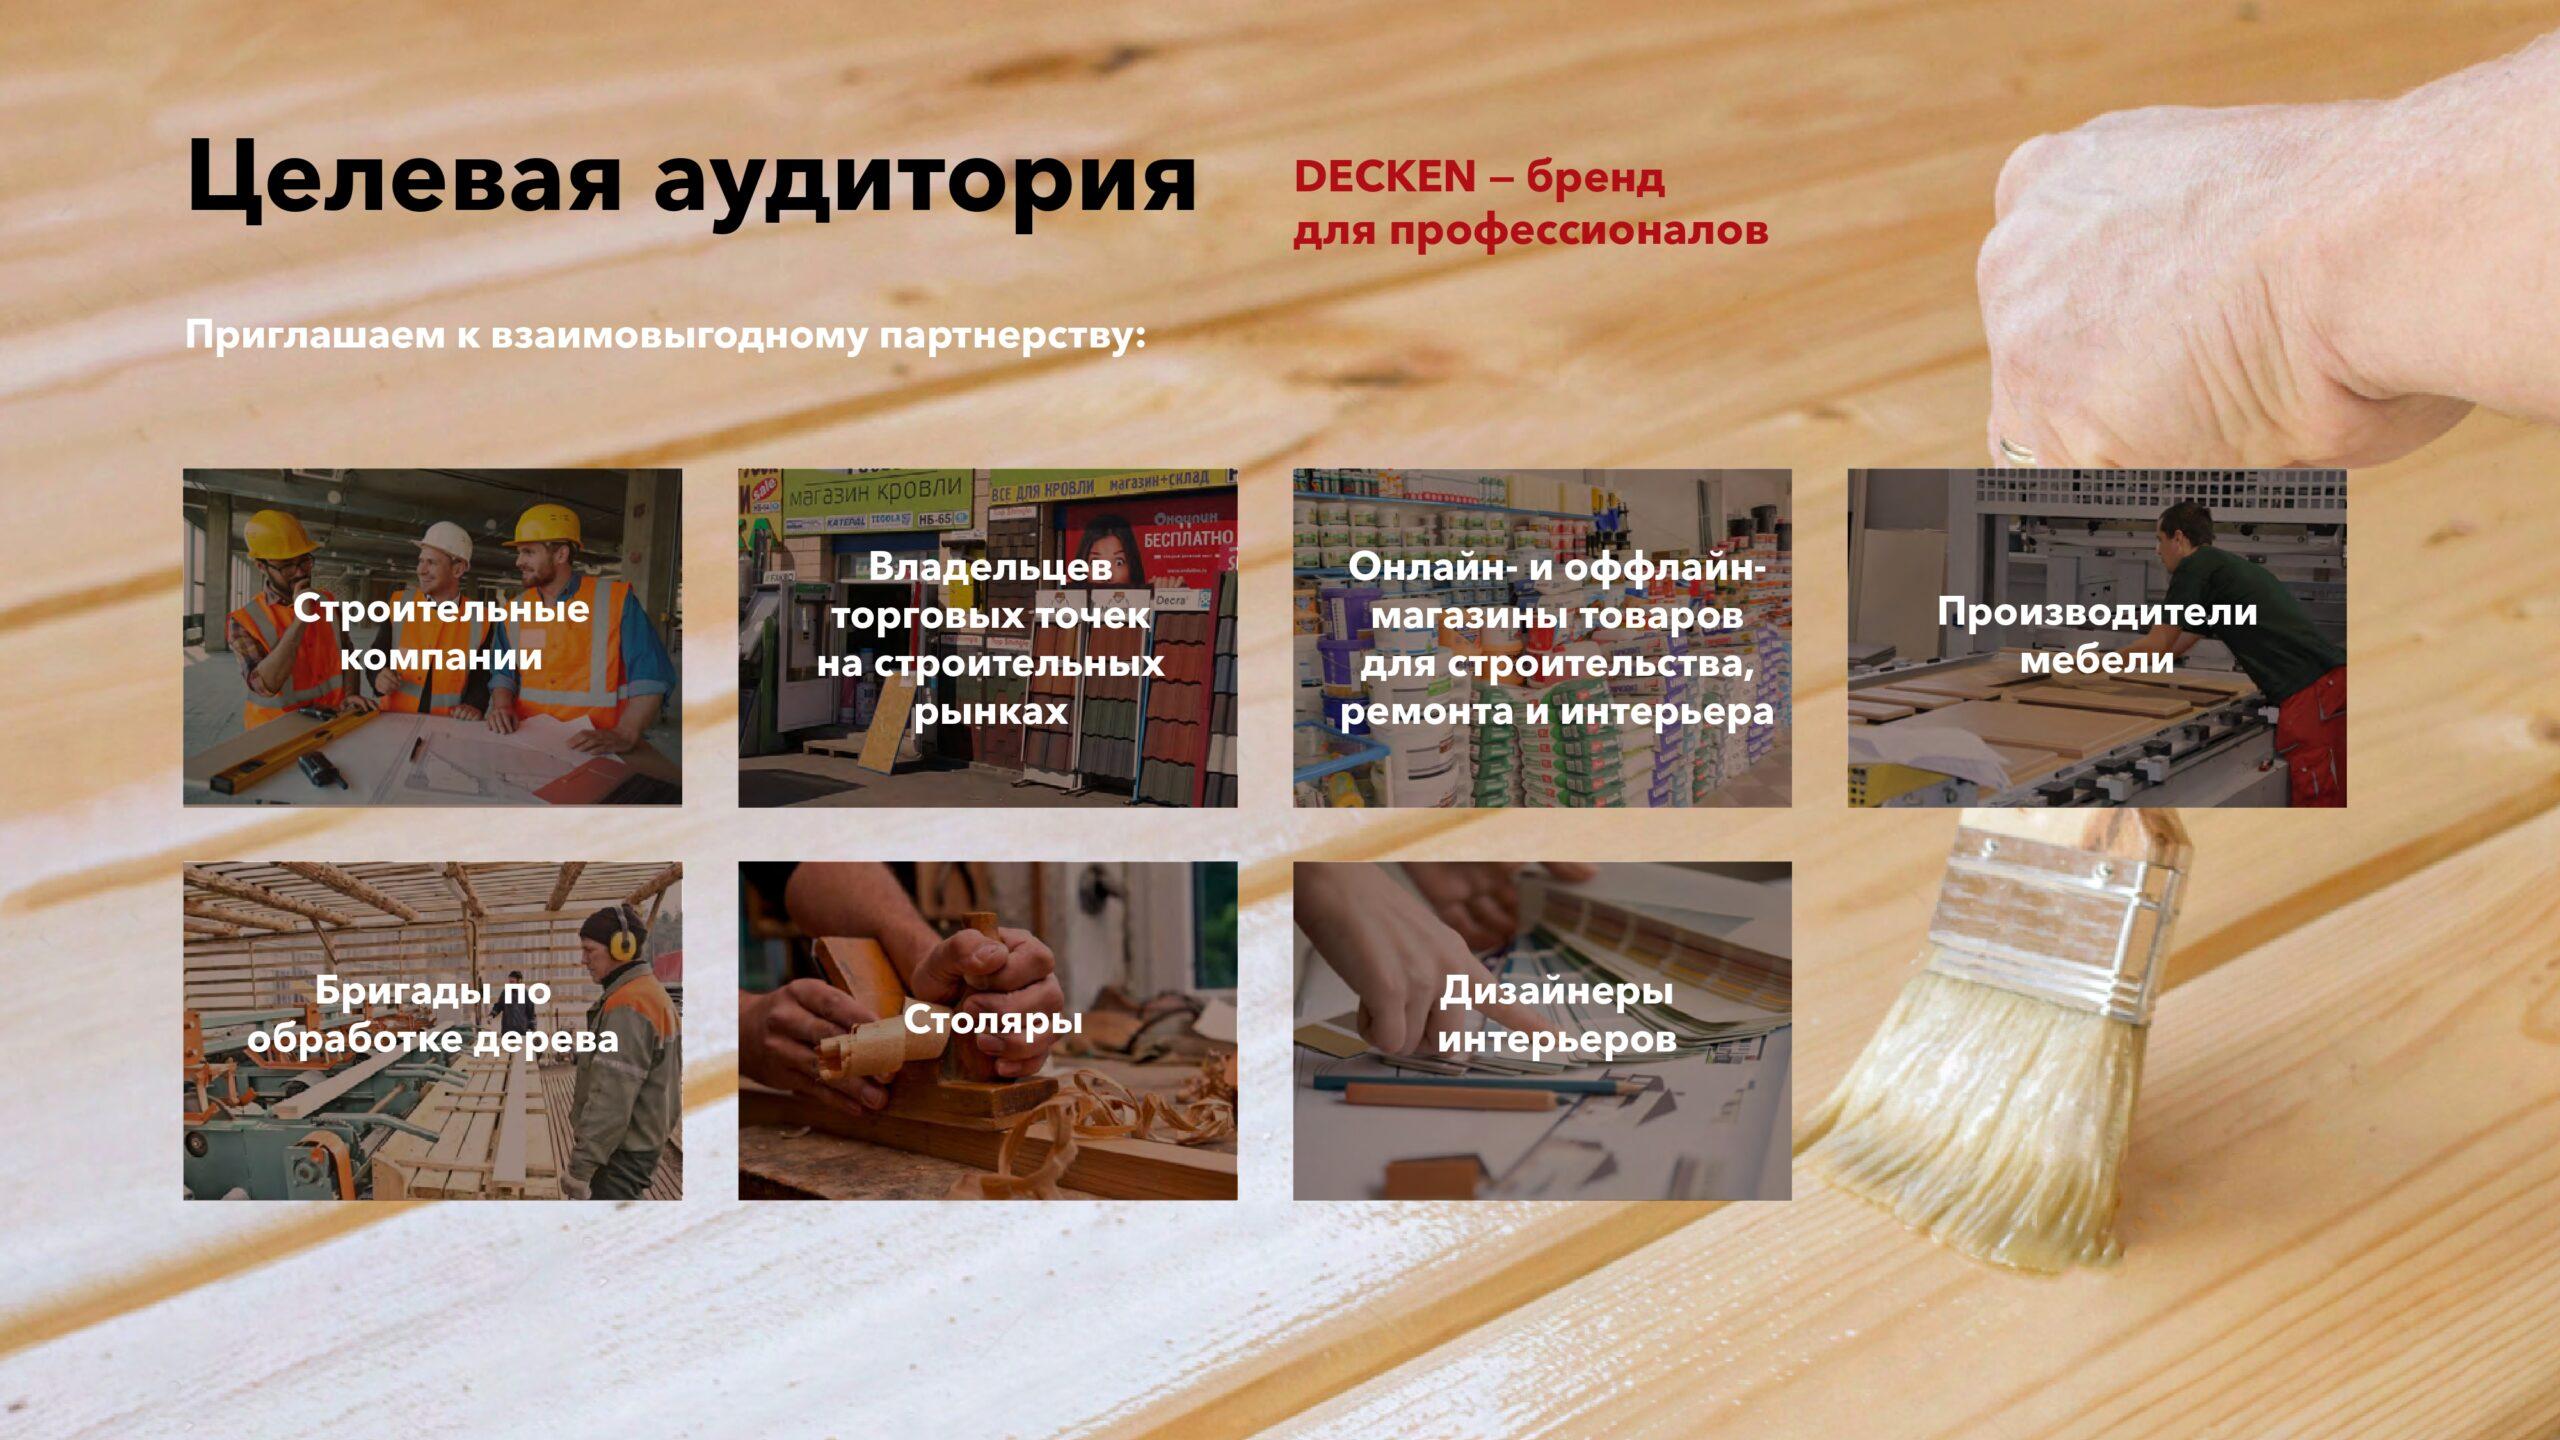 Презентация бренда масел и воска для обработки дерева